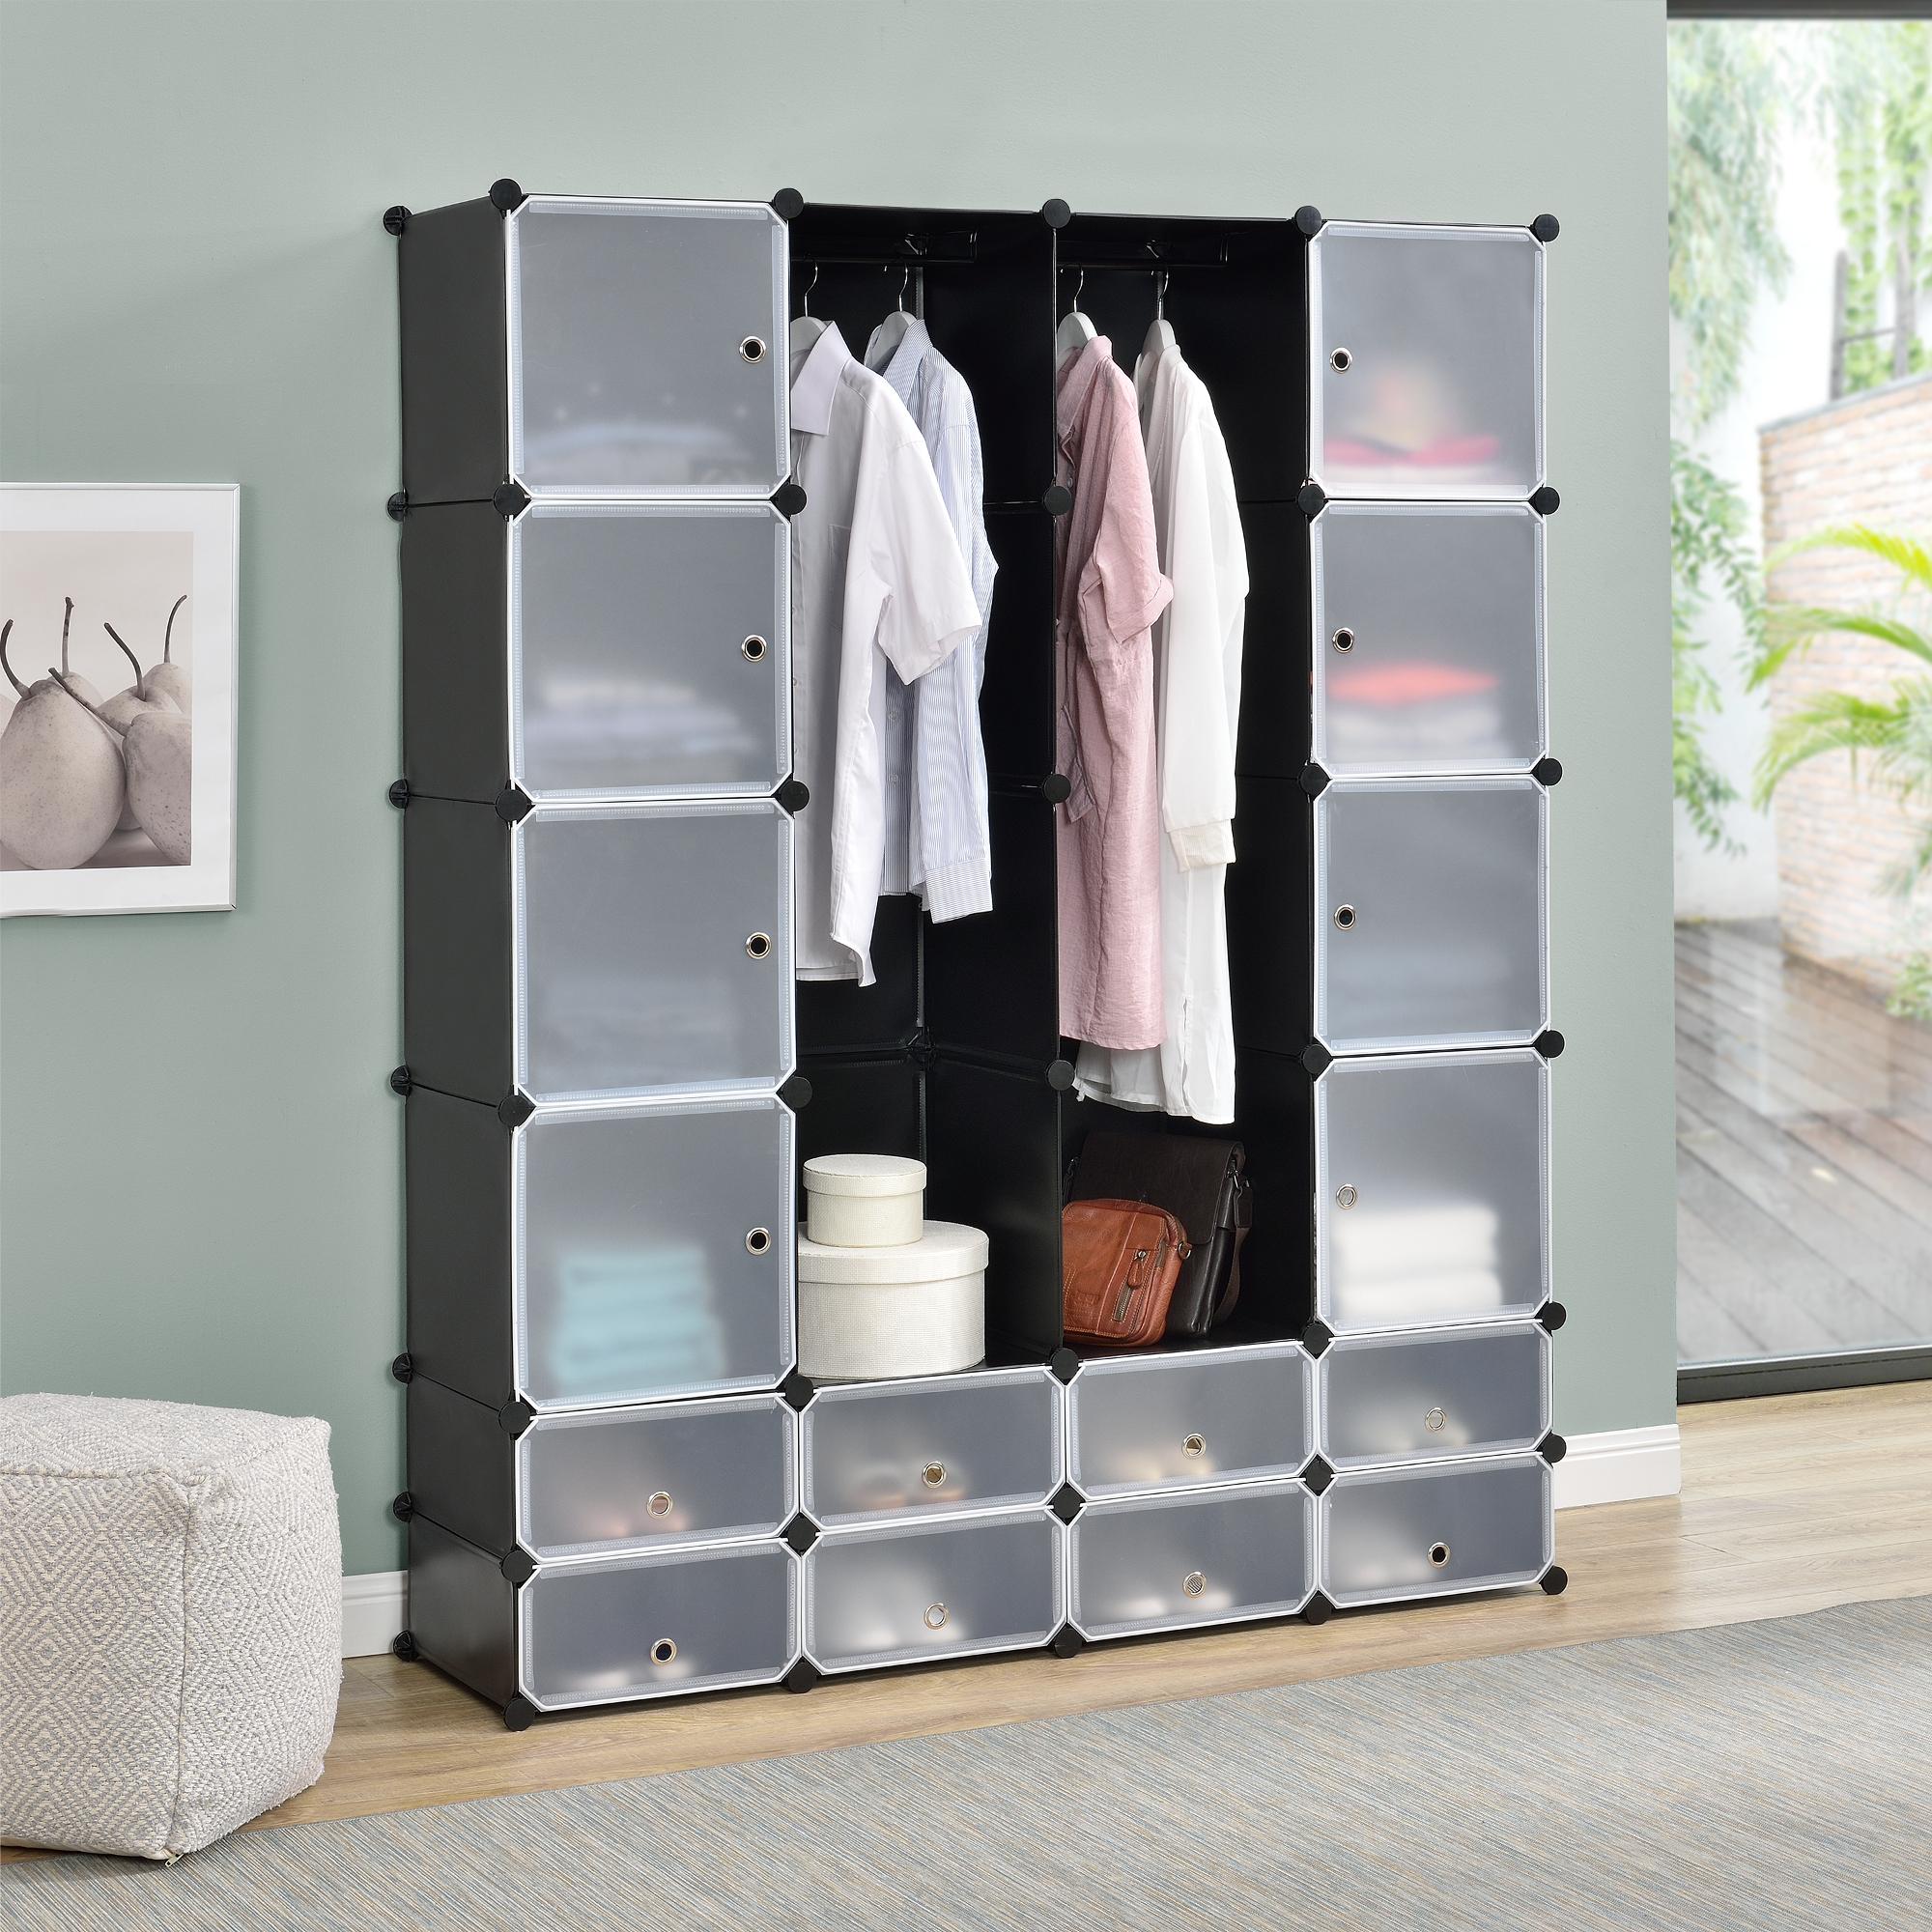 systemregal diy kleiderschrank t ren f cher. Black Bedroom Furniture Sets. Home Design Ideas